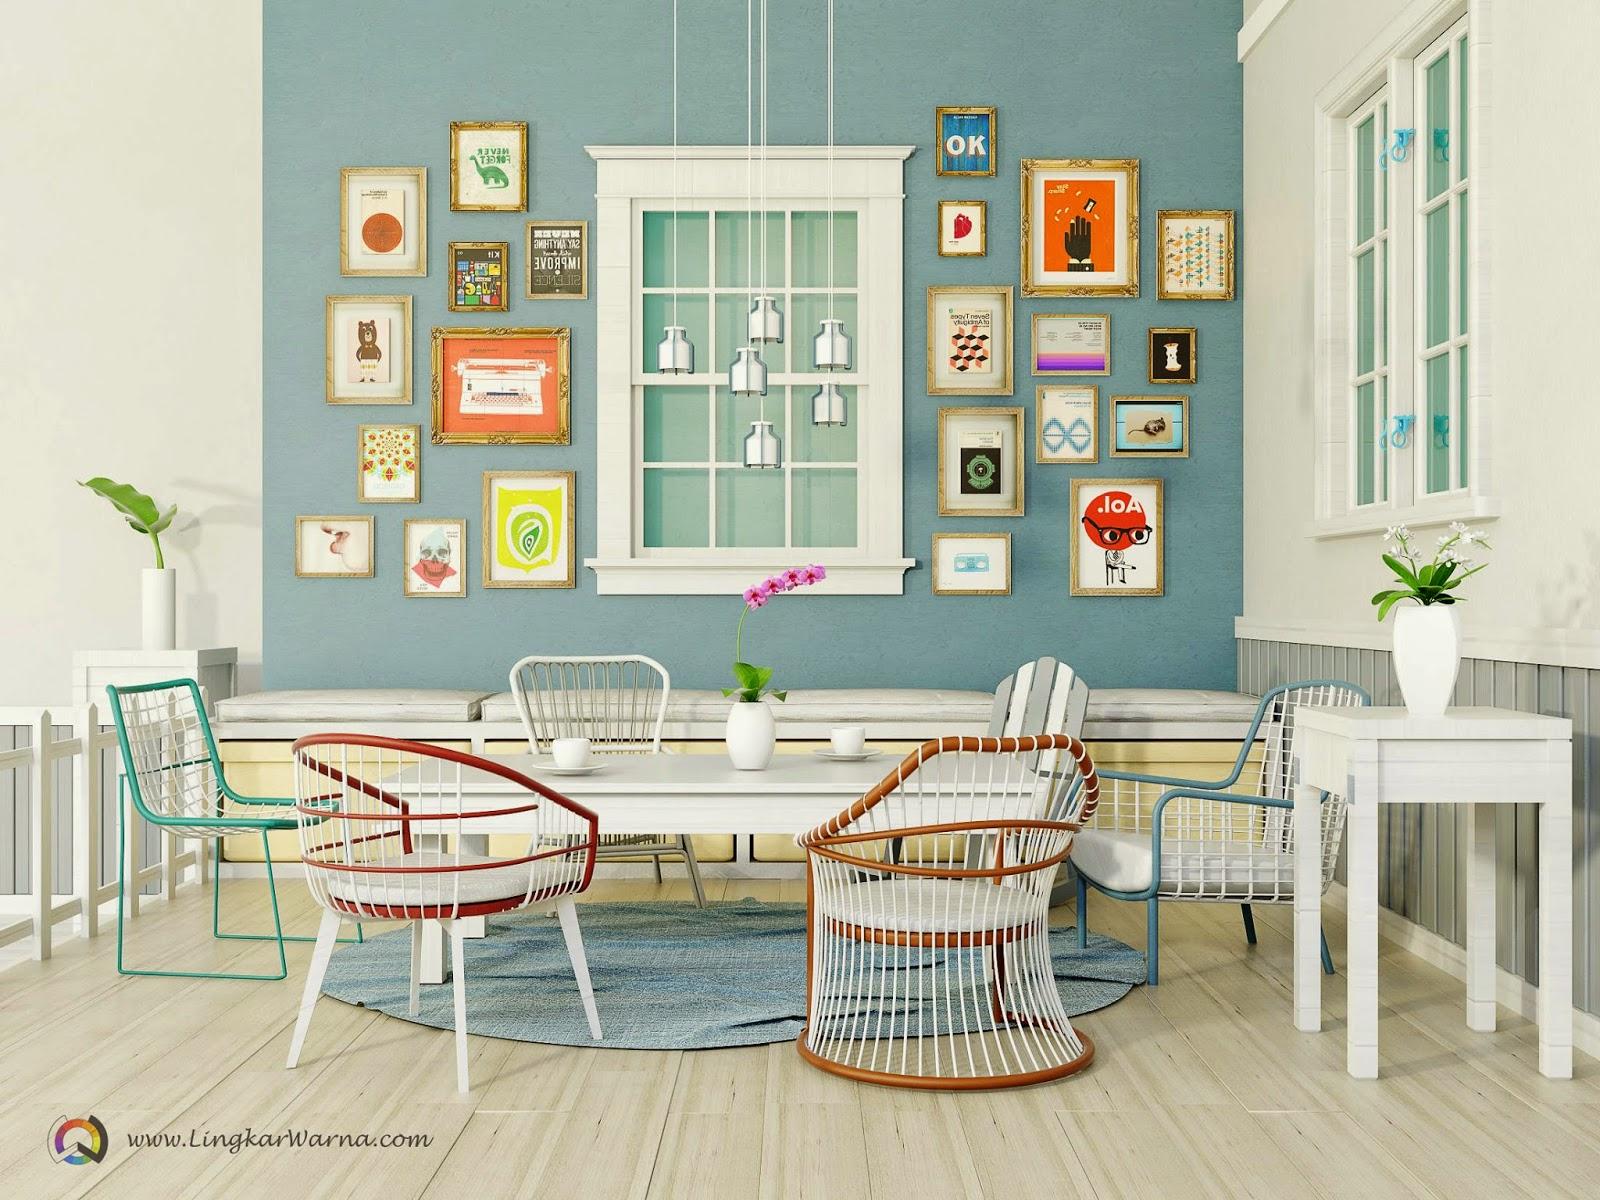 Interior desain rumah minimalis berpenampilan retro